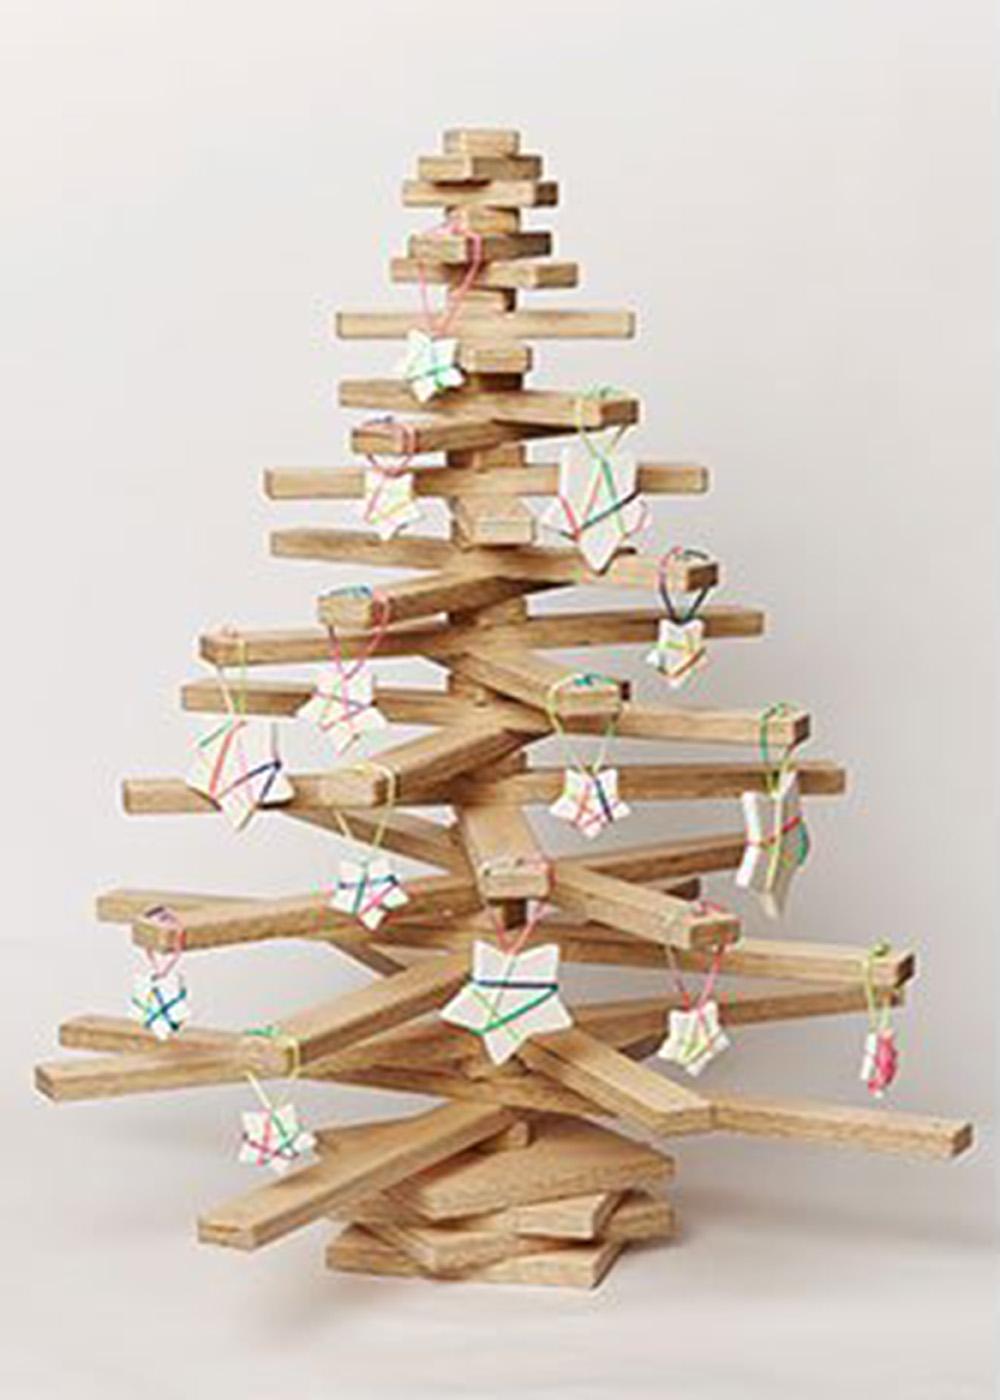 Arbol de madera 04